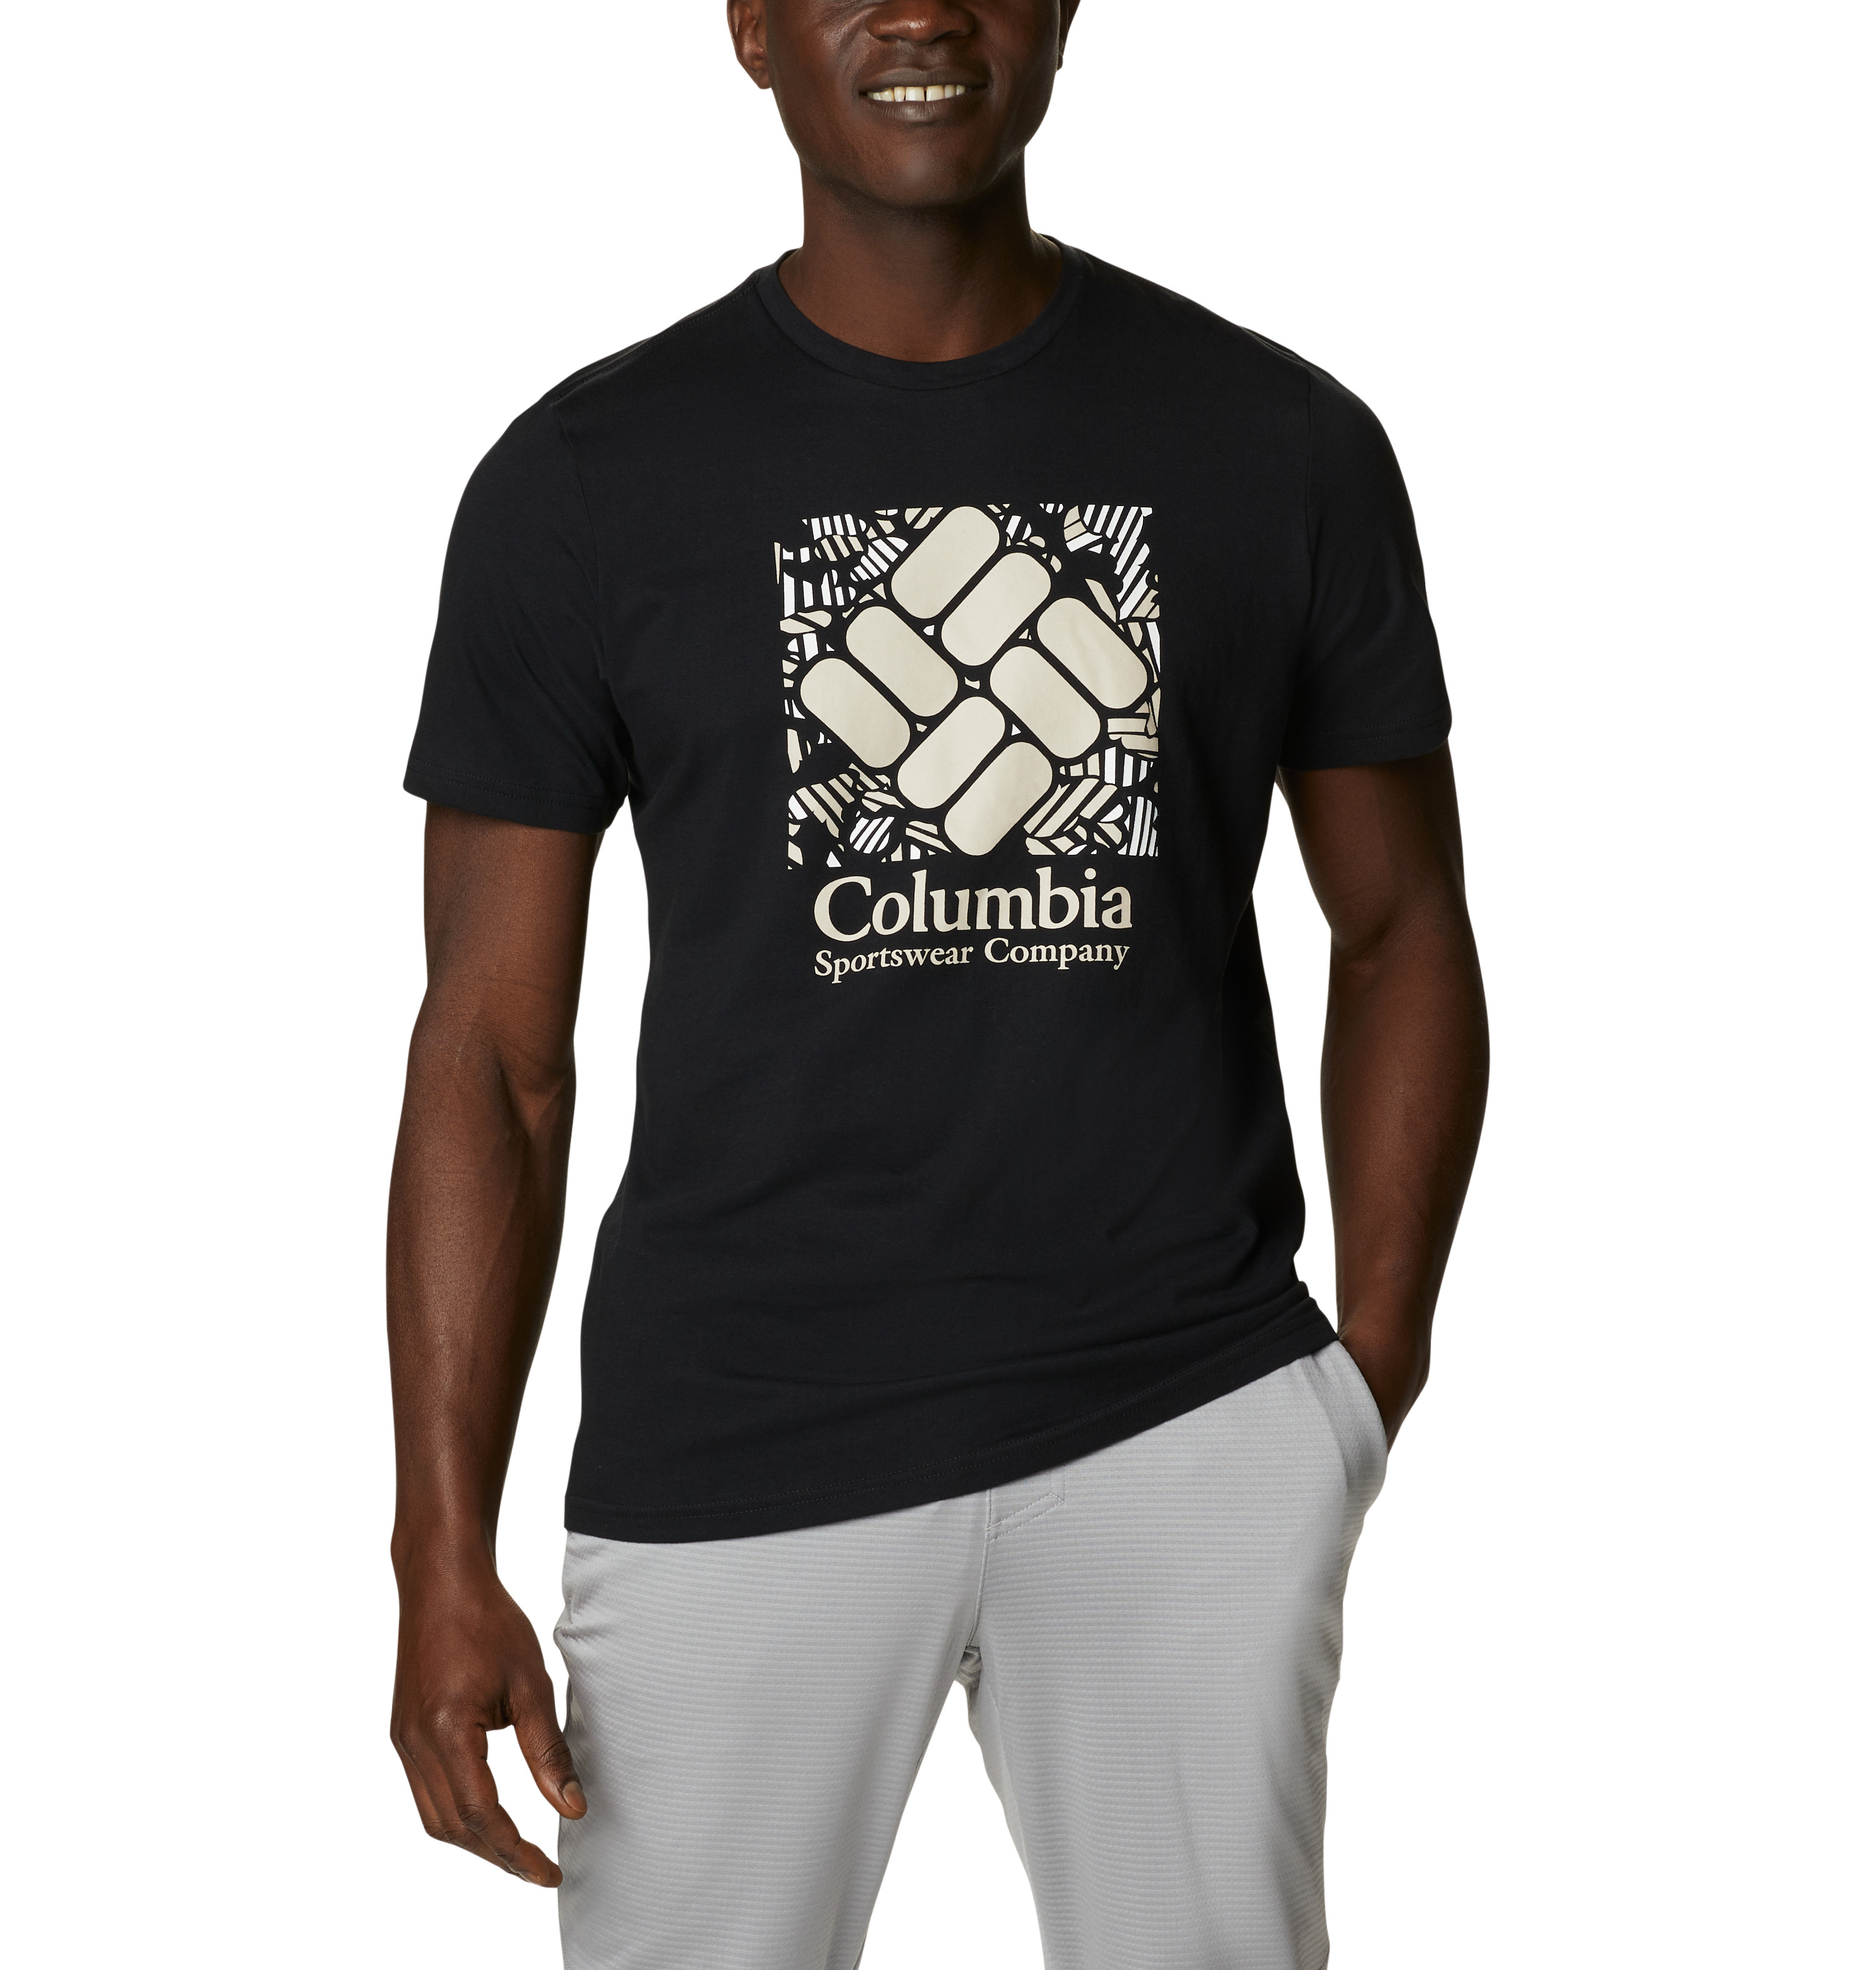 Columbia Rapid Ridge™ Graphic t-shirt, black, large